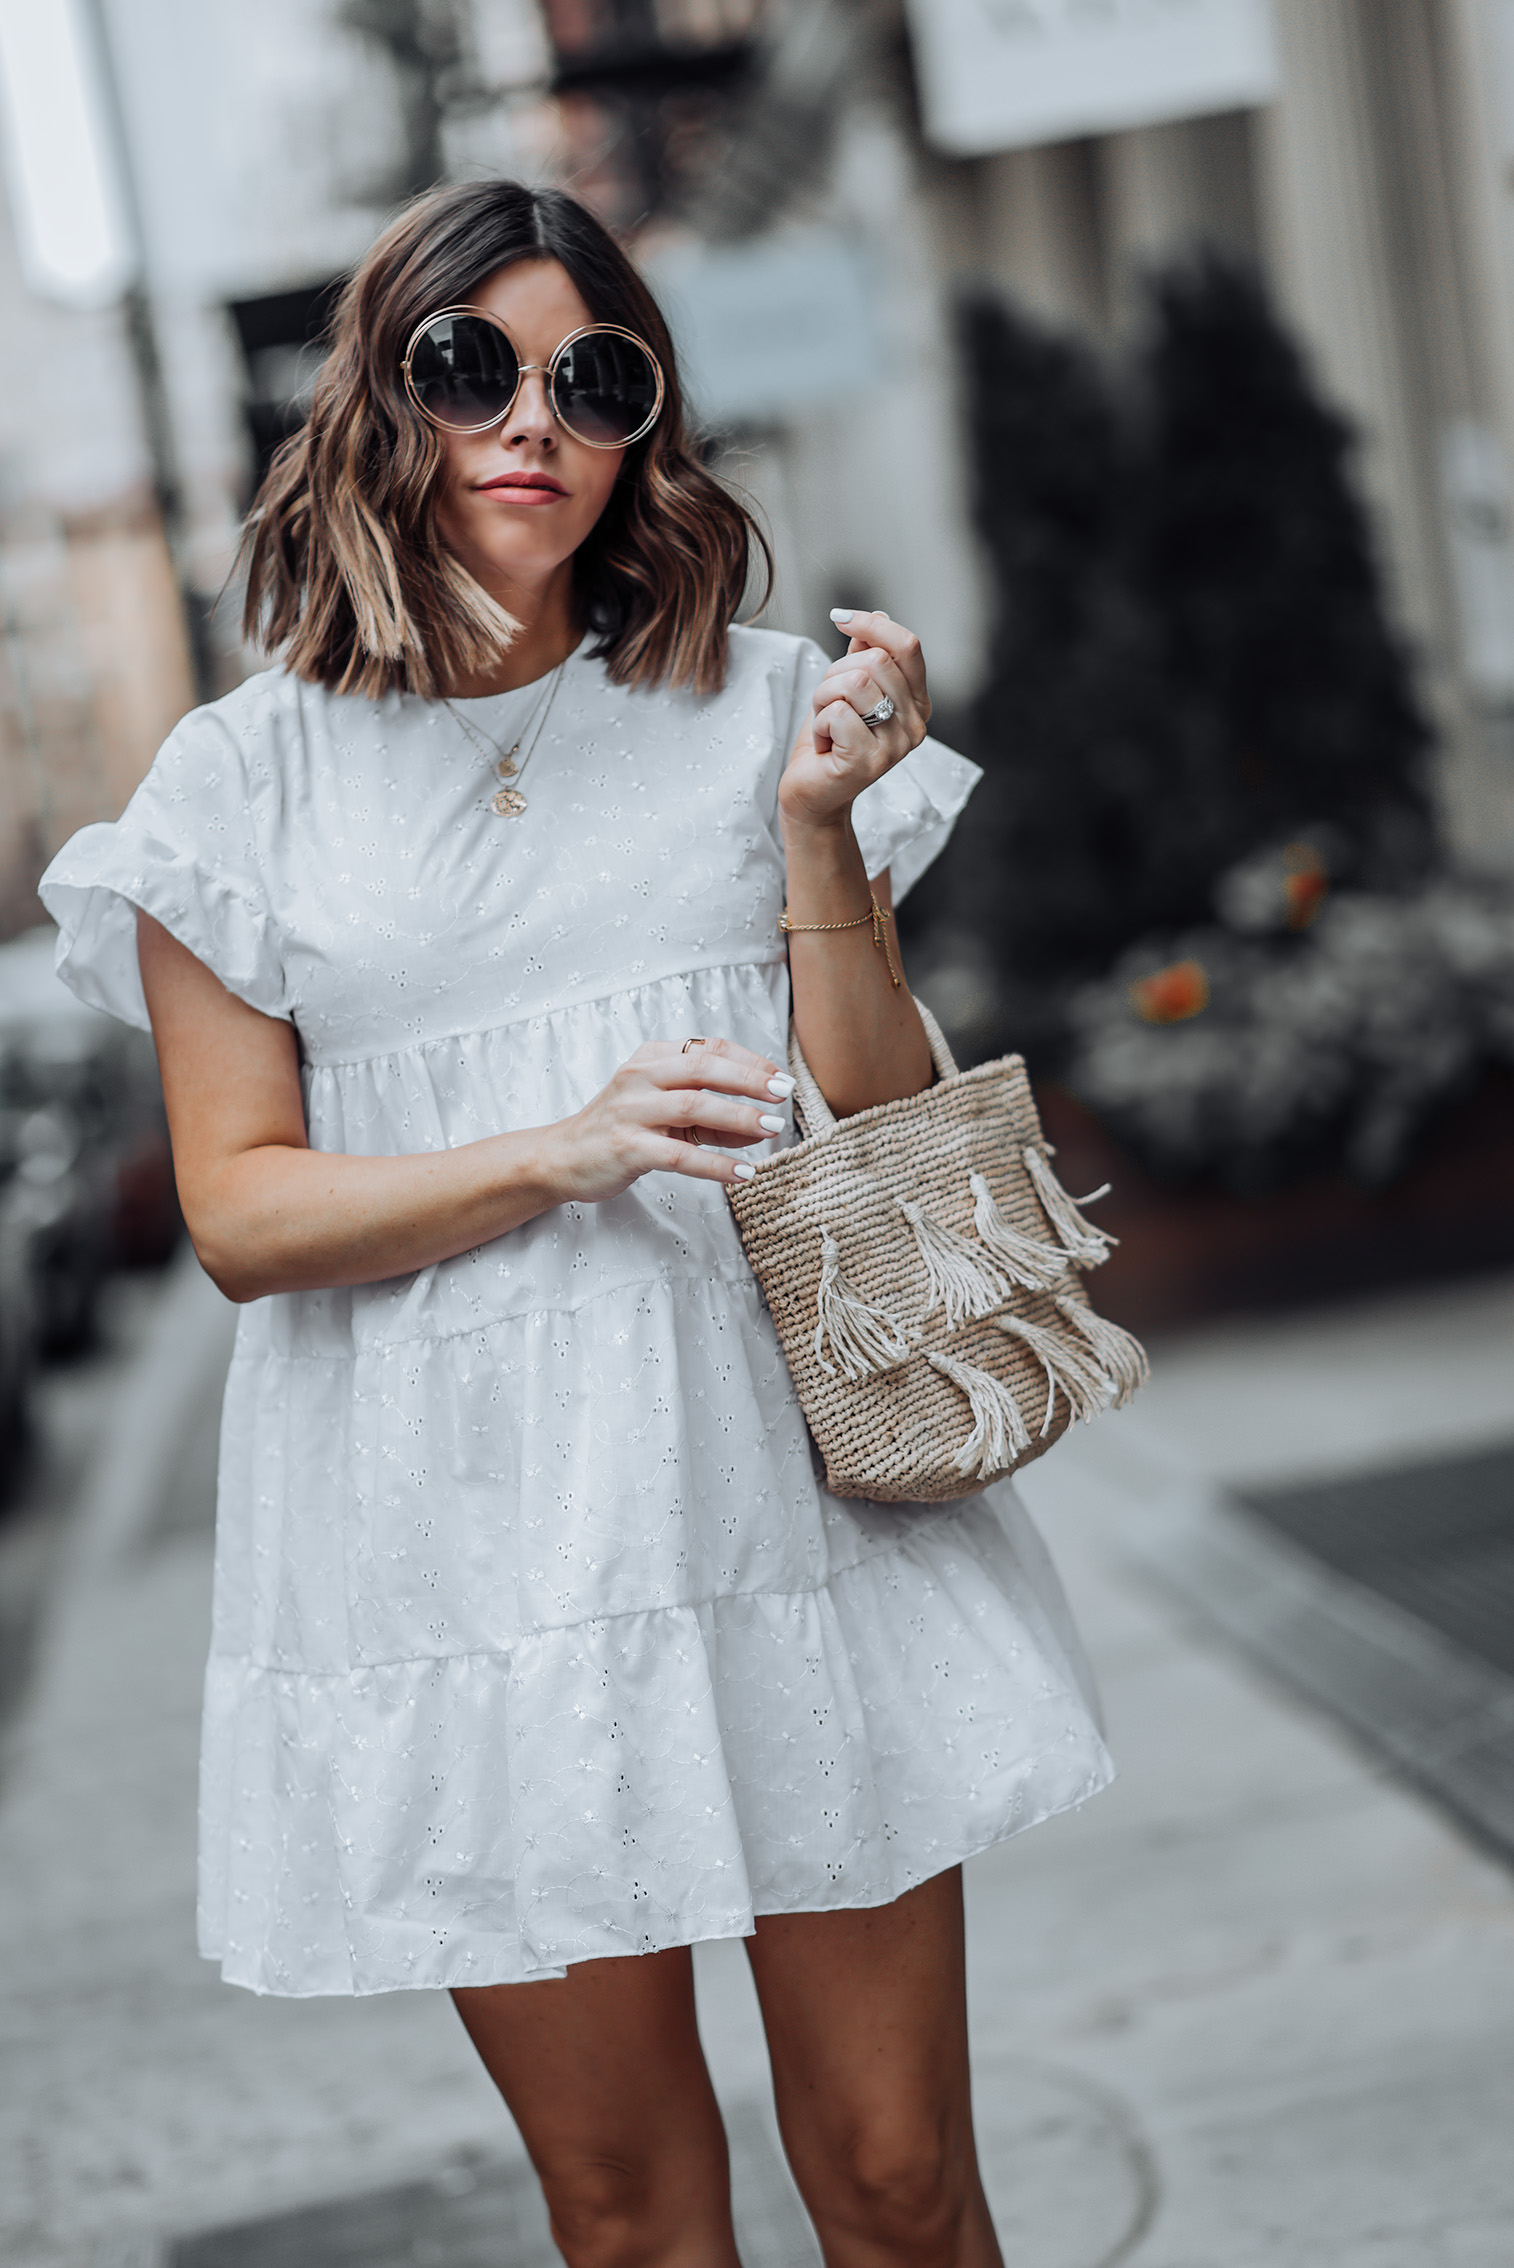 Babydoll dress   Tassel Bag   Sunnies   #liketkit #LWD #casualoutfits #streetstyle